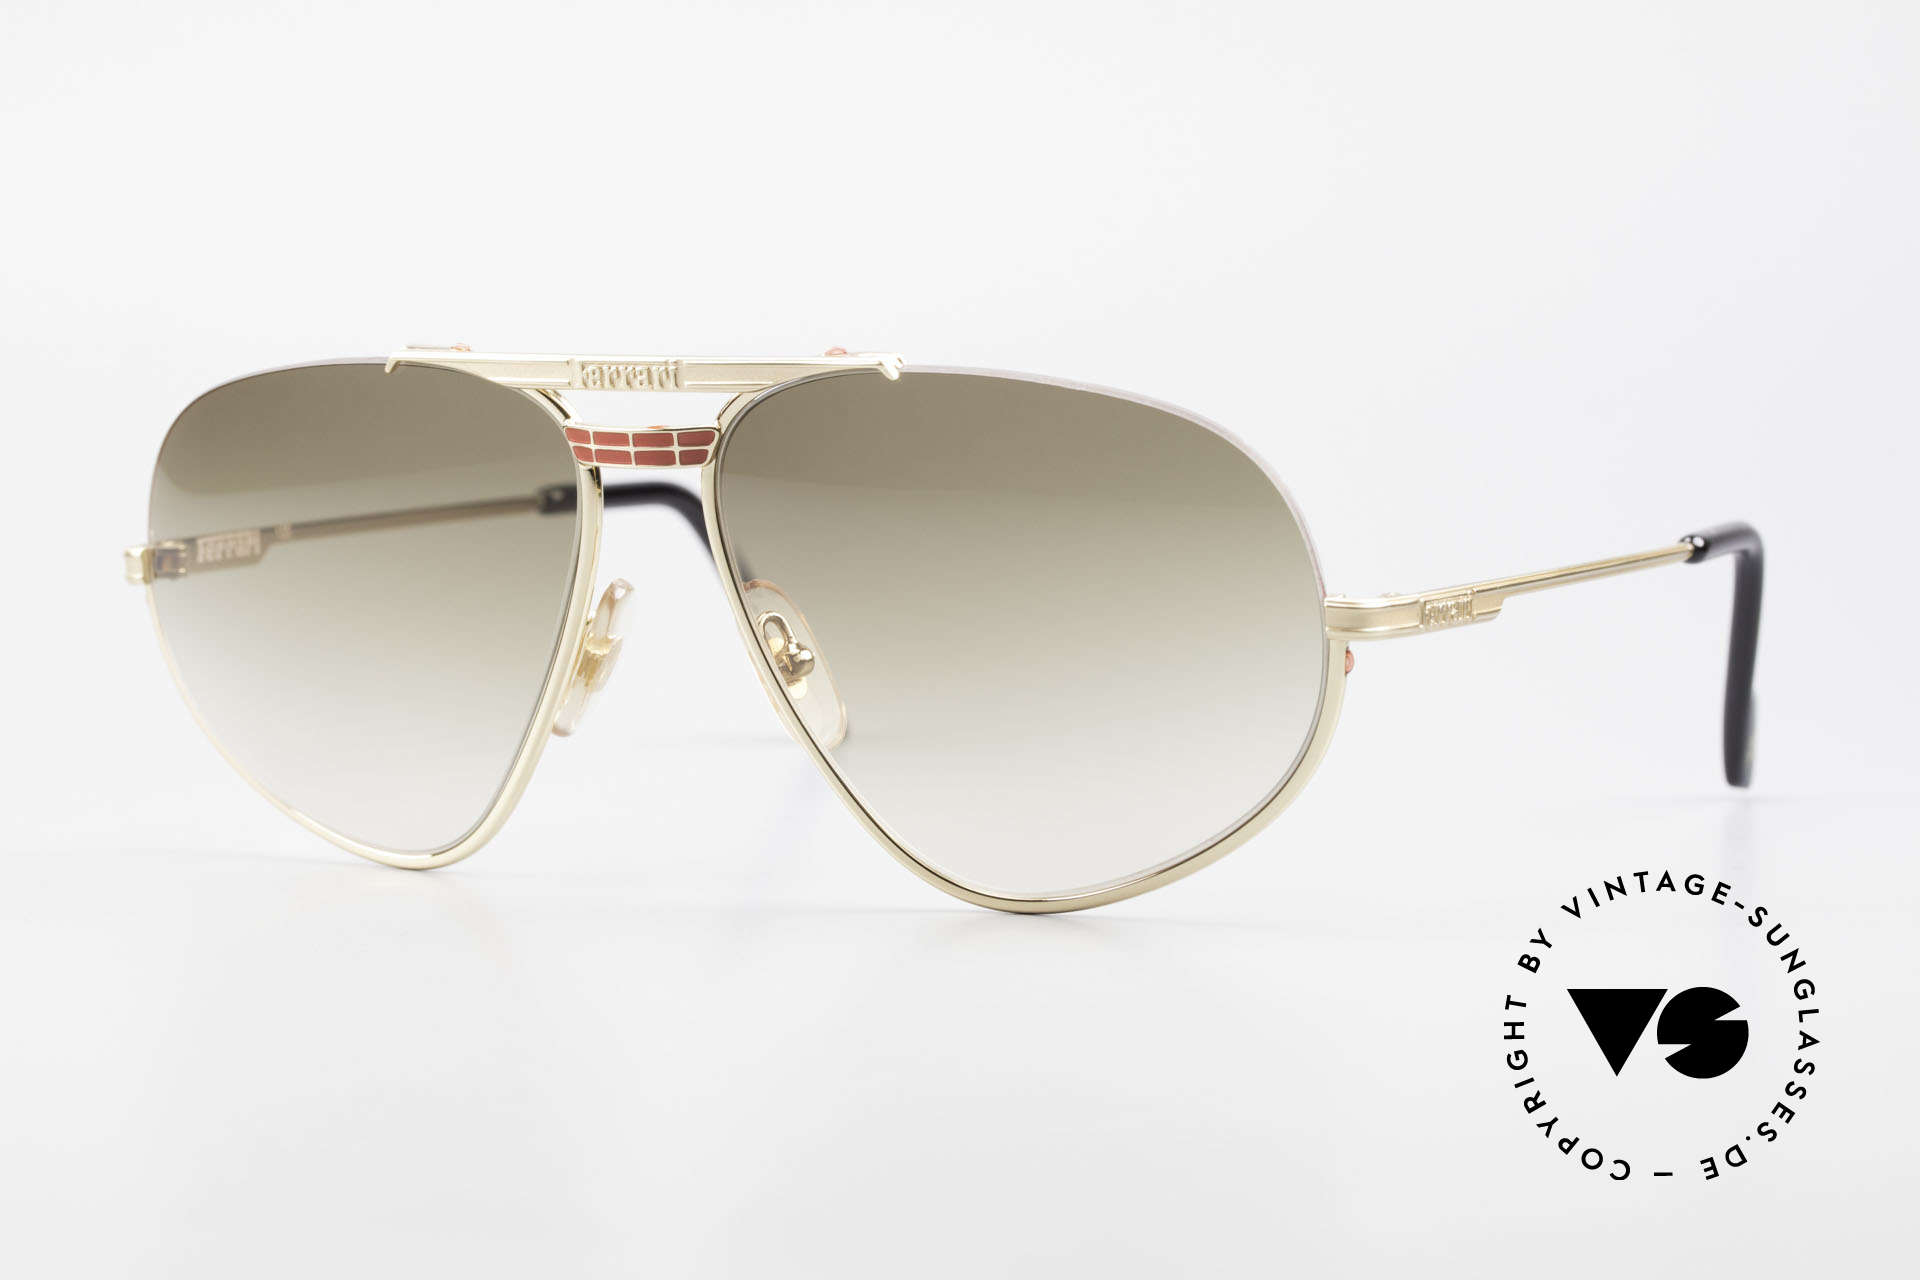 Ferrari F2 Ferrari Formula 1 Sunglasses, rare classic shades by famous Ferrari from the 90's, Made for Men